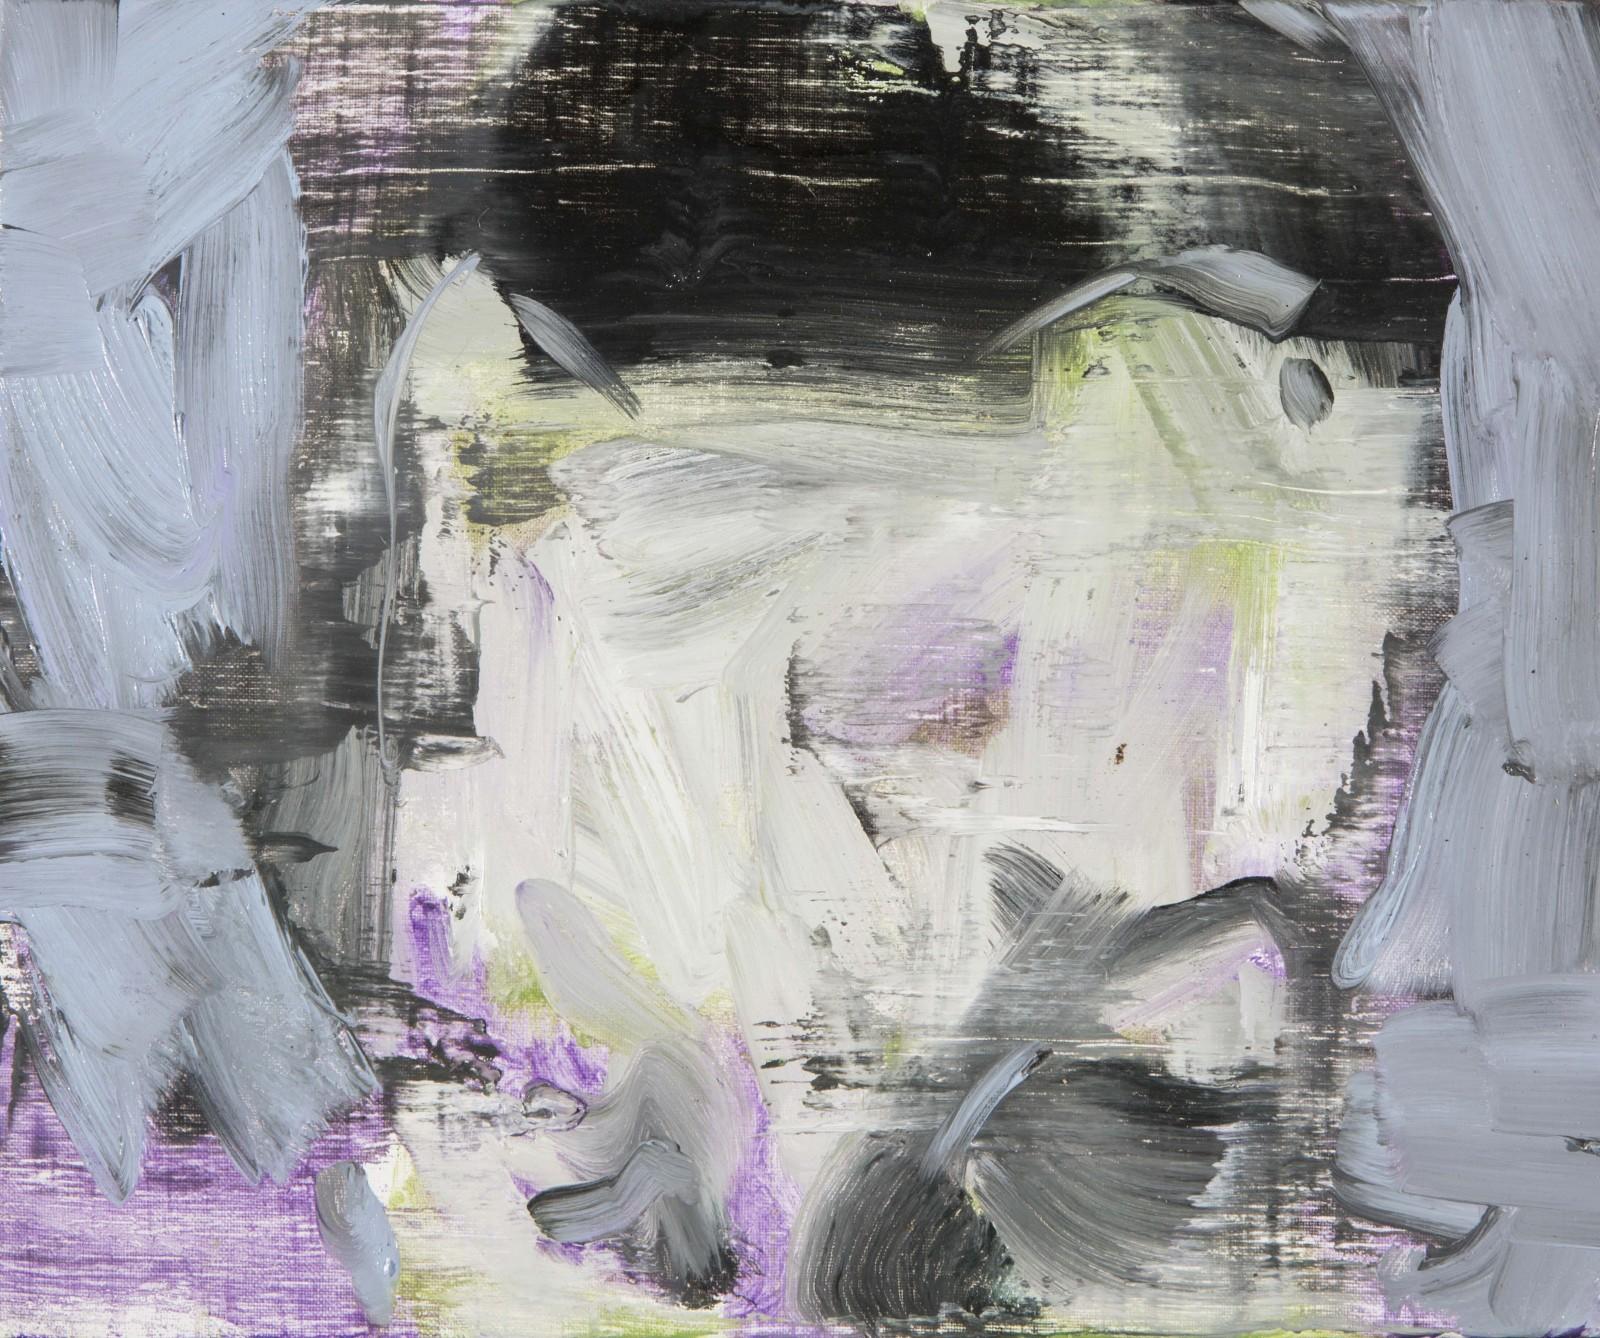 Paolo-Maggis-2015-Head-38x46